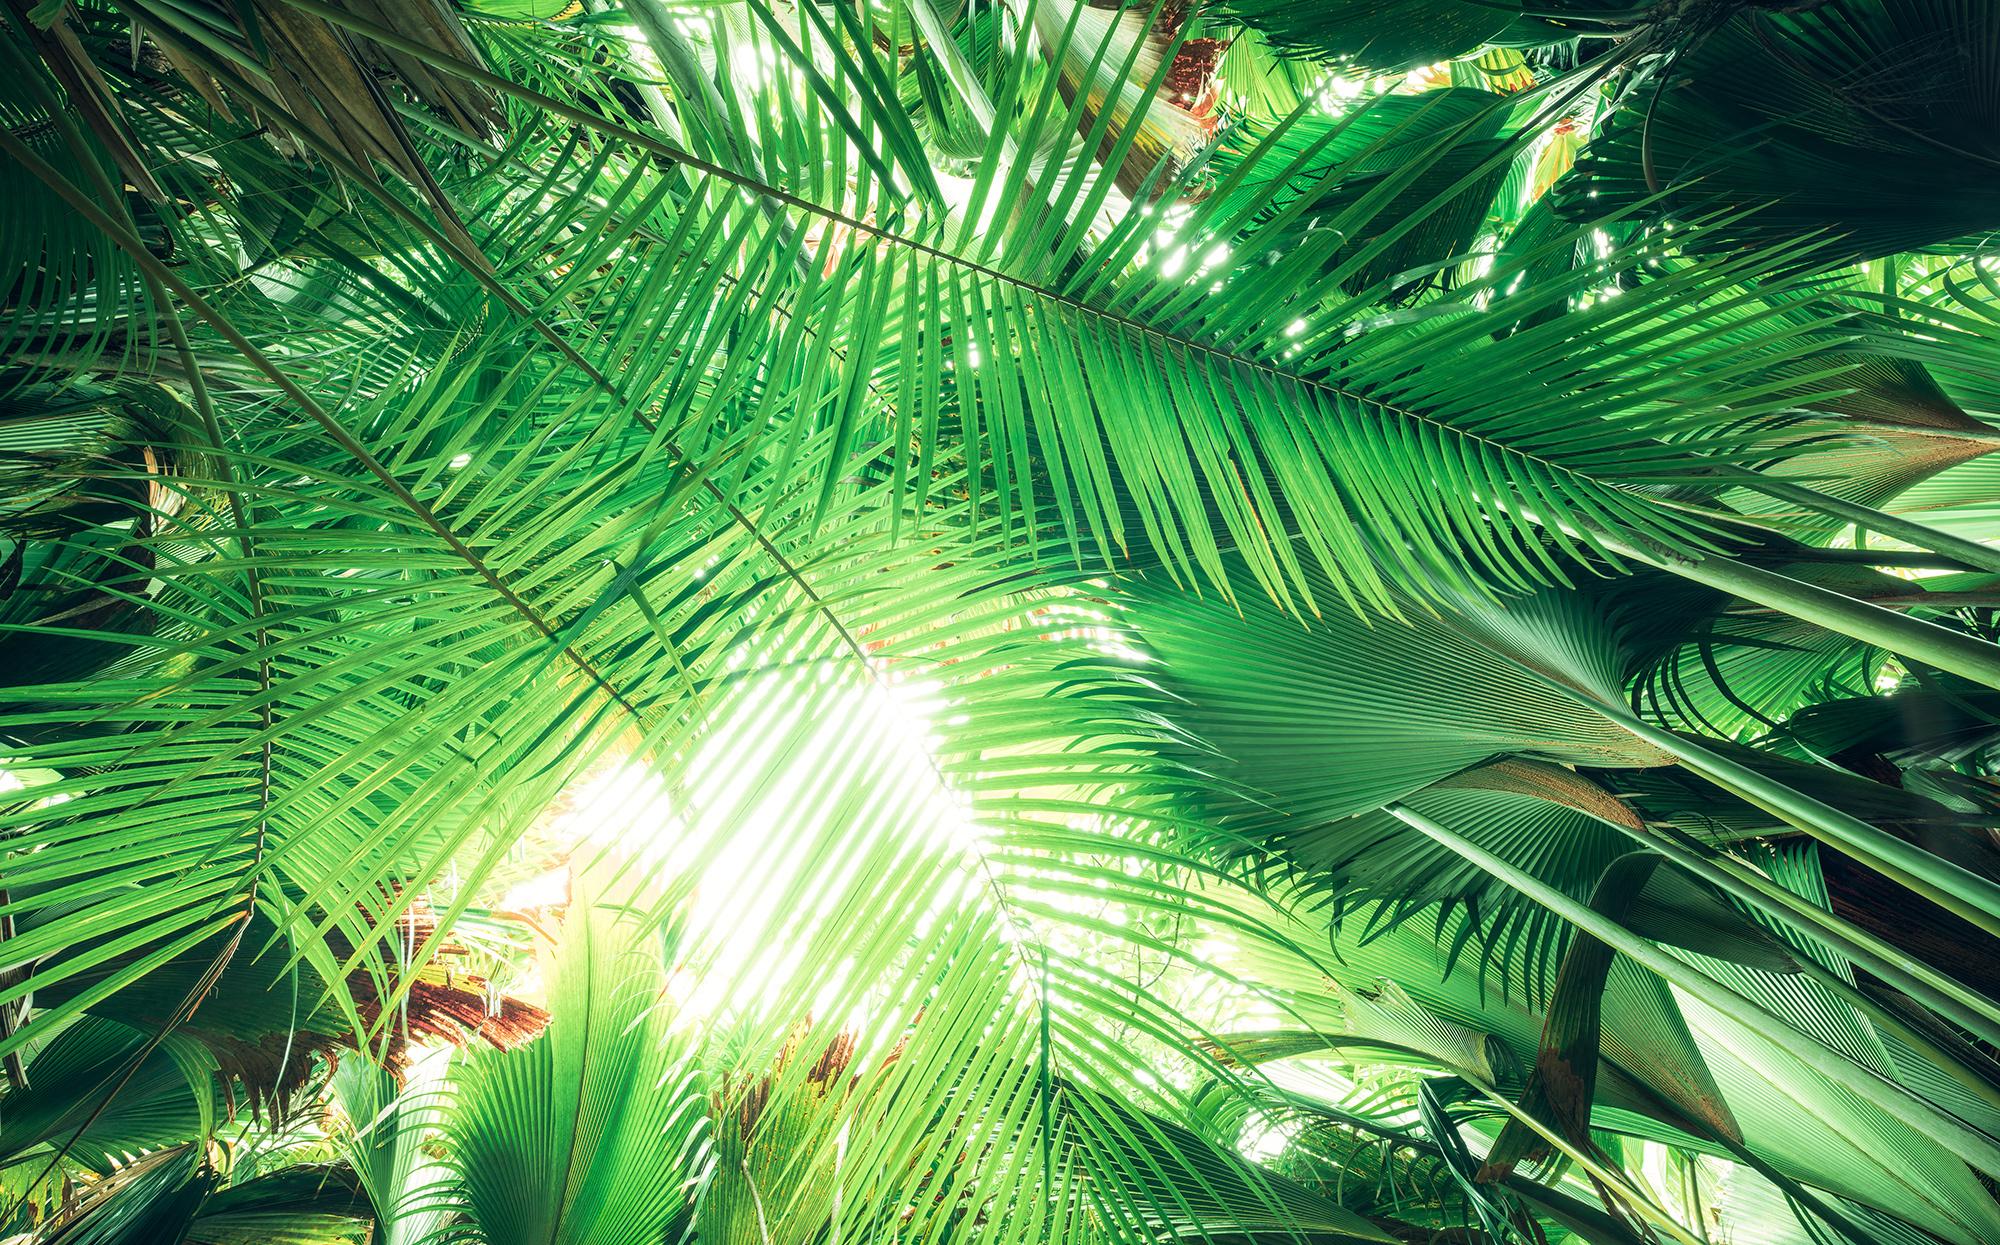 Stefan Hefele Edition 2 Fotobehang Komar - Natuur behang DSCHUNGELDACH